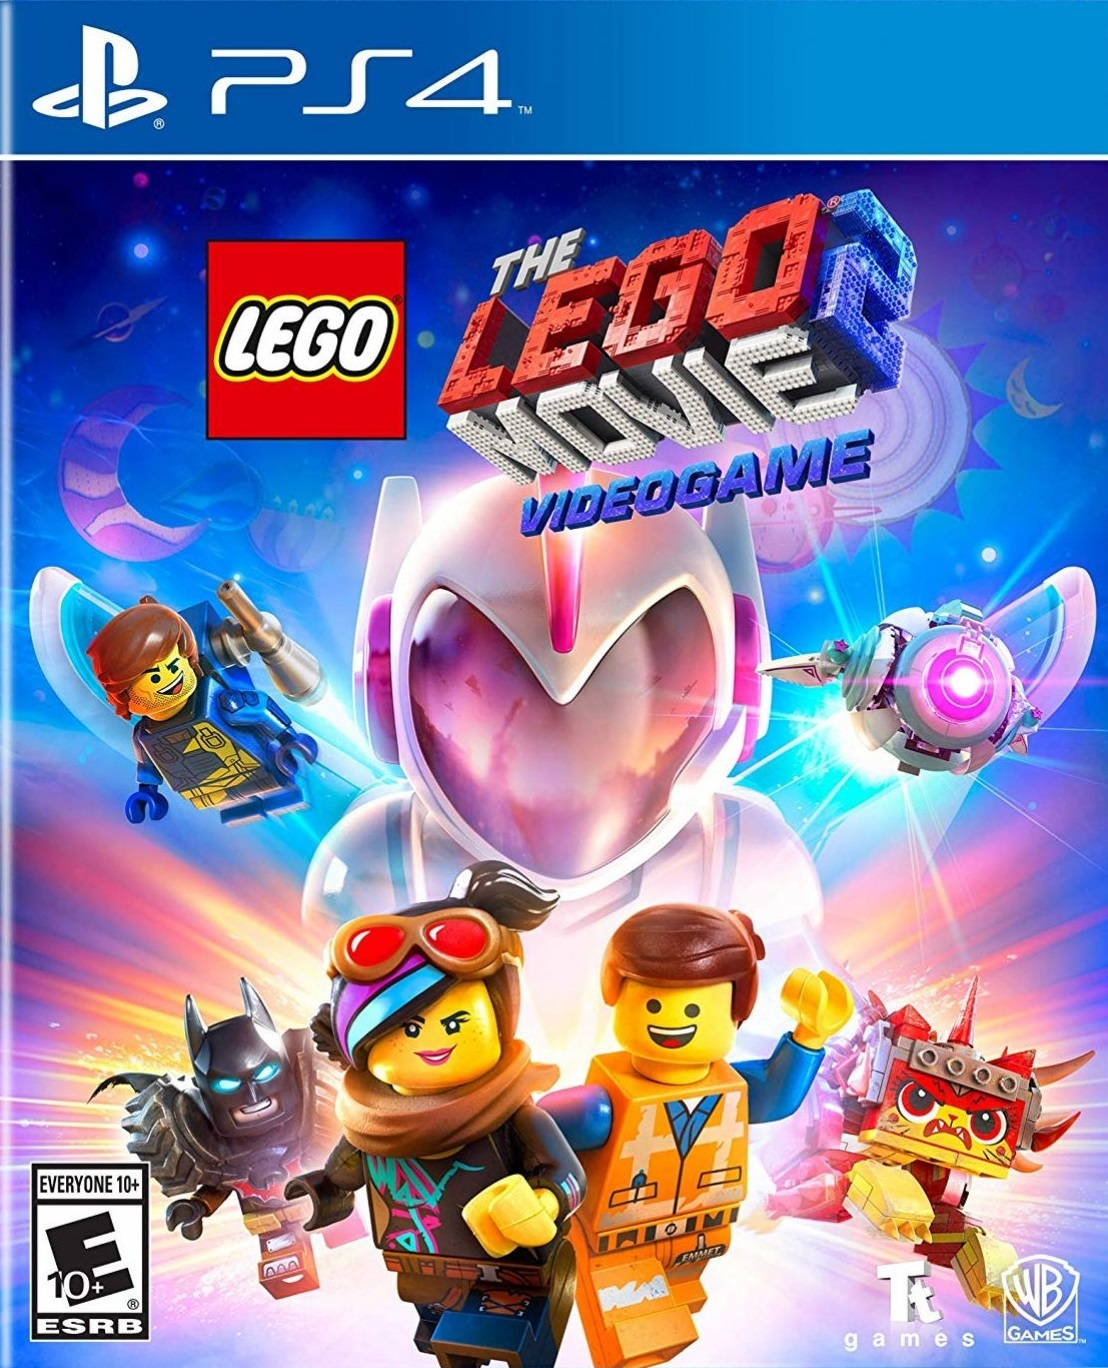 the-lego-movie-2-videogame-580415.9.jpg